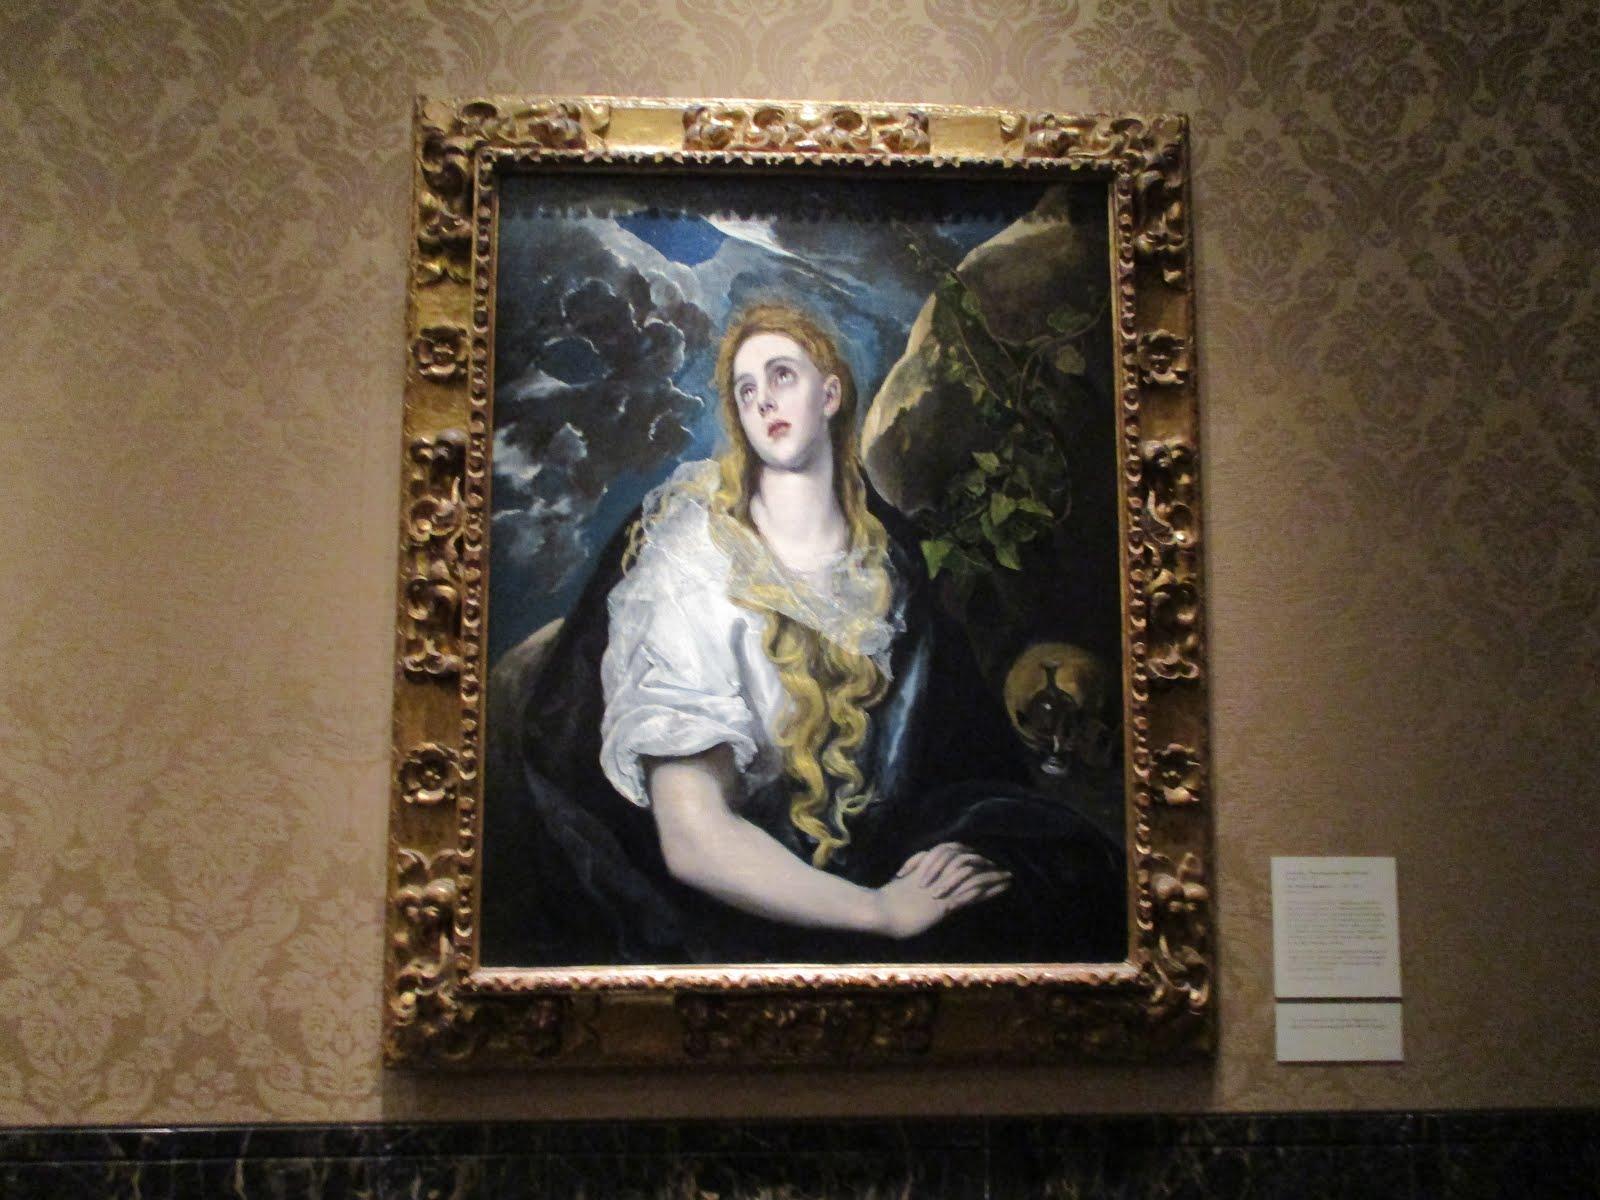 NELSON ATKINS MUSEUM OF ART KANSAS CITY MISOURRI